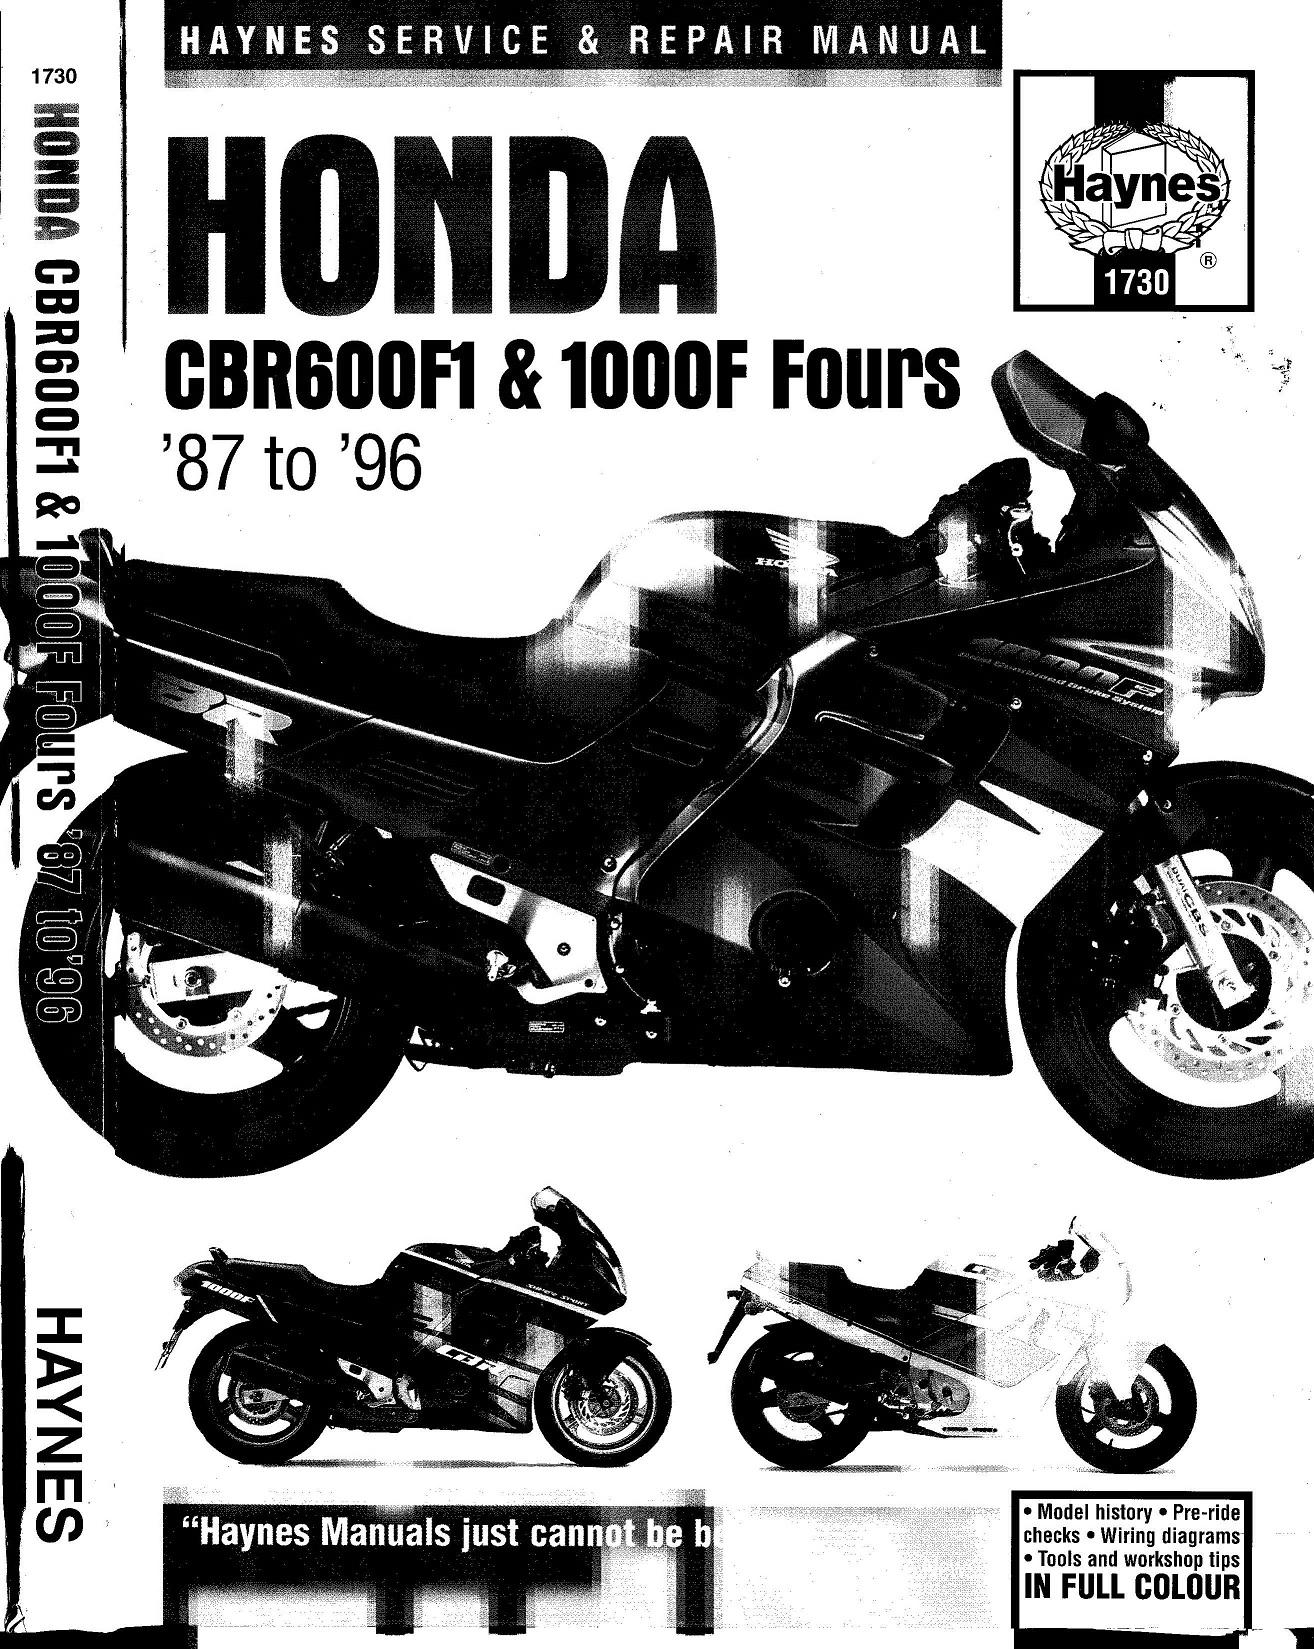 Workshop manual for Honda CBR1000F (1987-1996)